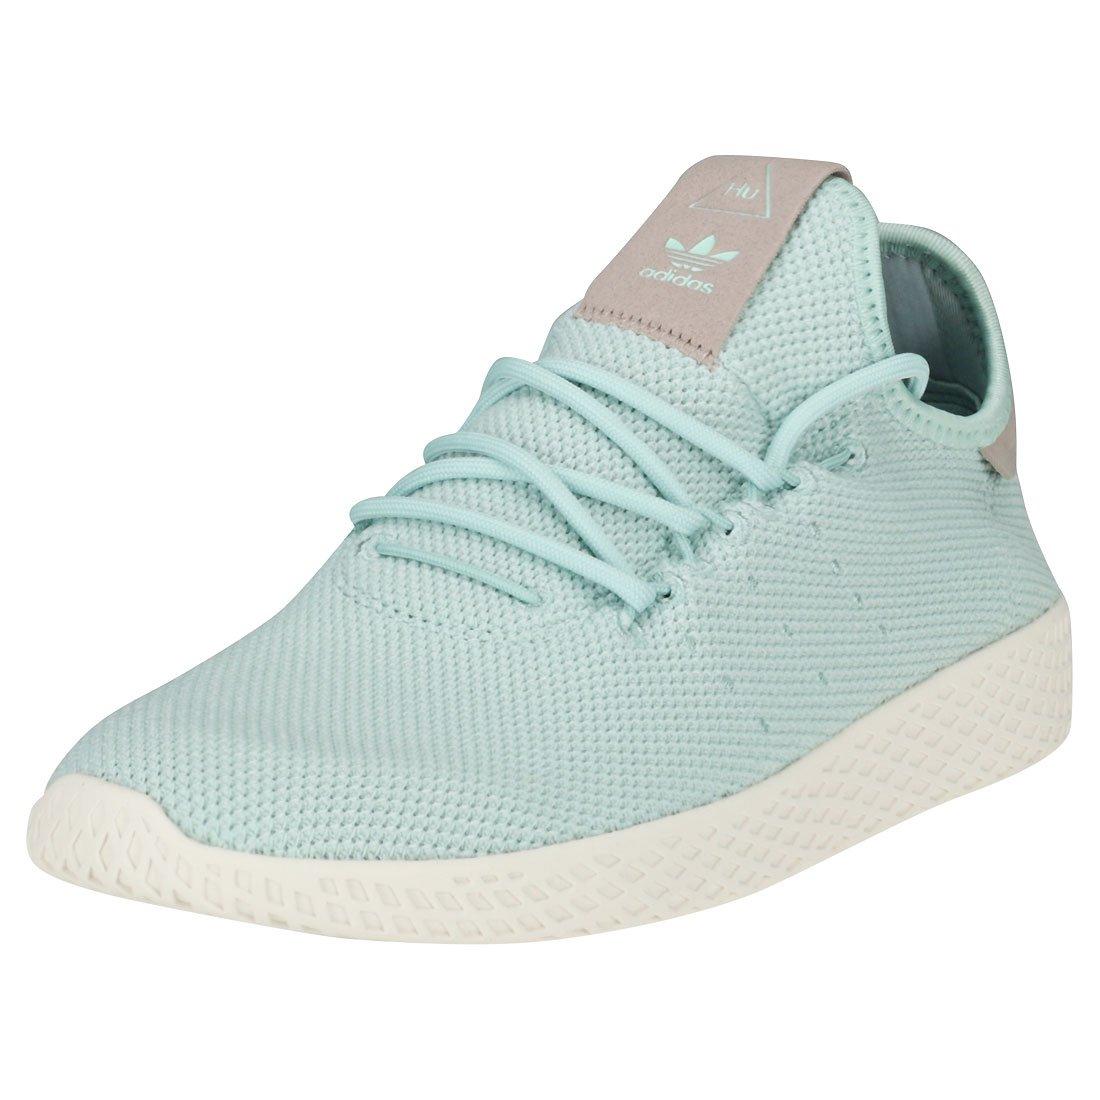 48e832fb84cb4 adidas Originals Sneaker PW Tennis hu W DB2557 Türkis. Adidas Pharrell  Williams ...